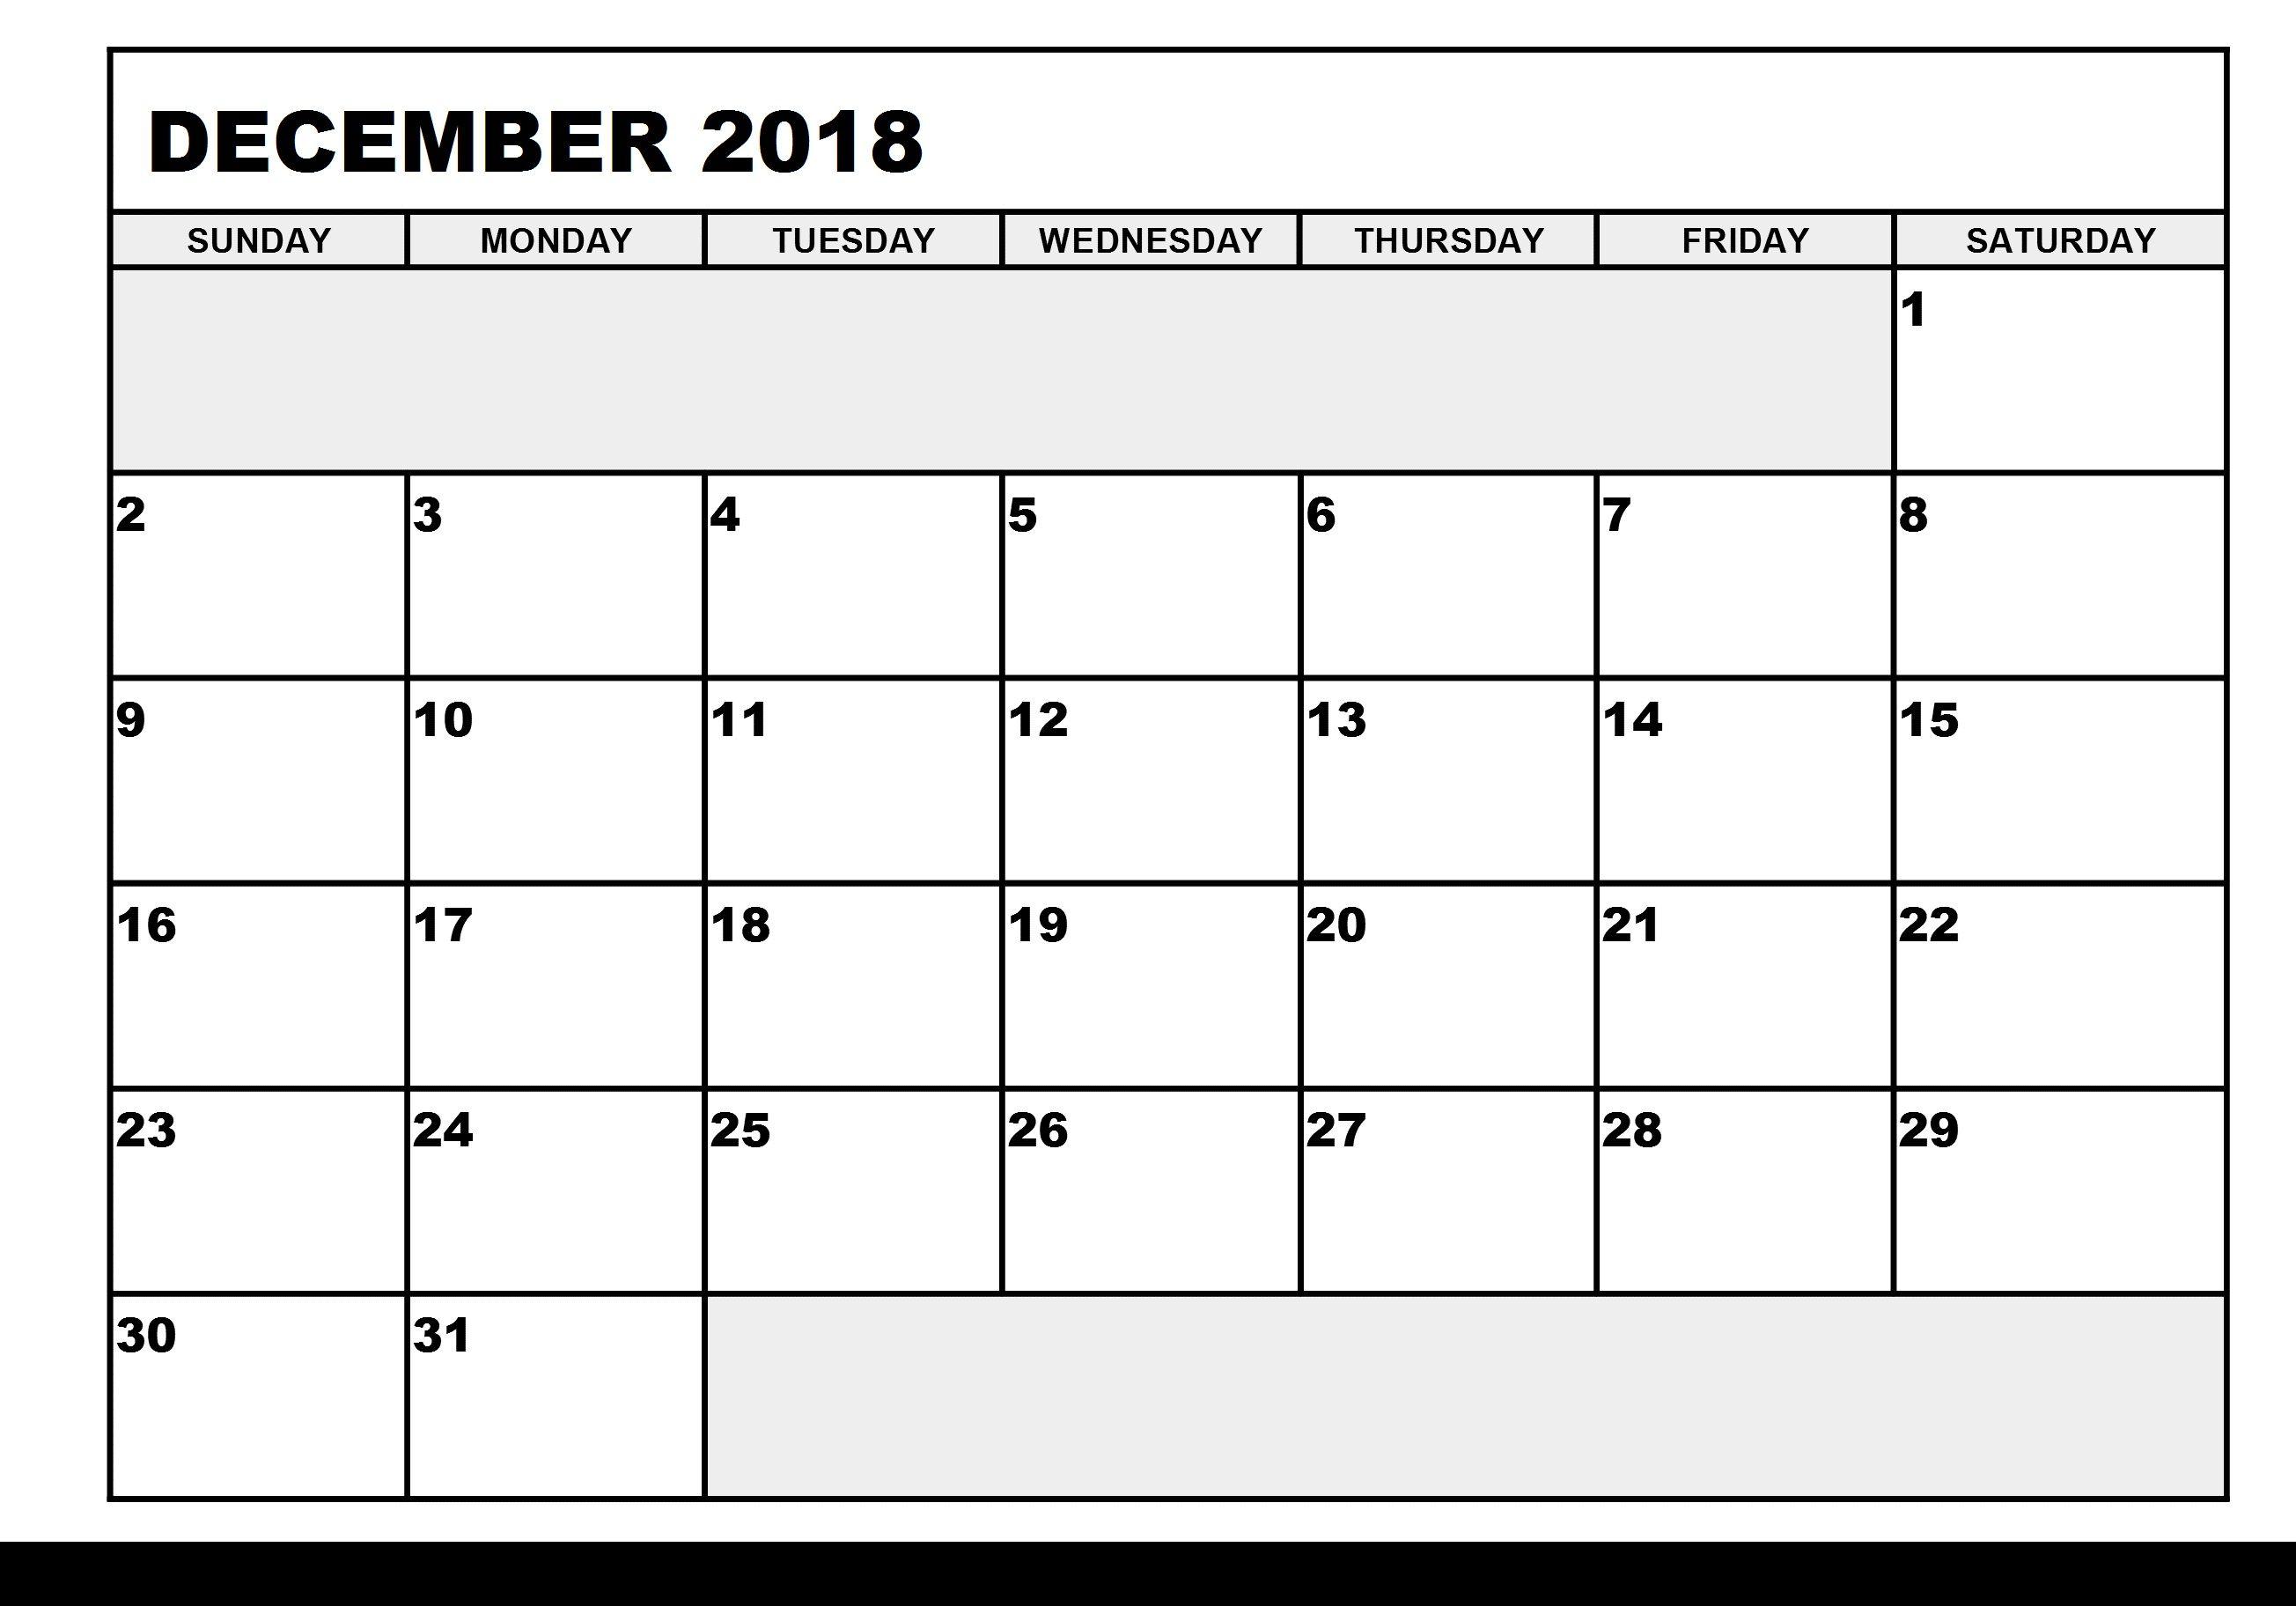 December 2018 Printable Calendar With Holidays   December 2018 within Calendar Planner Template Excel December